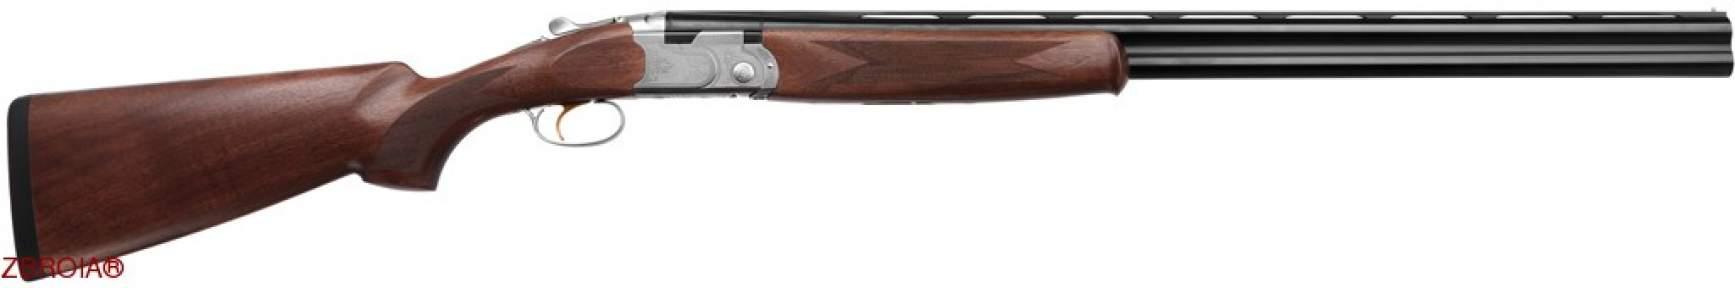 Ружье Beretta 686 Silver Pigeon I Single Trigger MC кал. 12/76